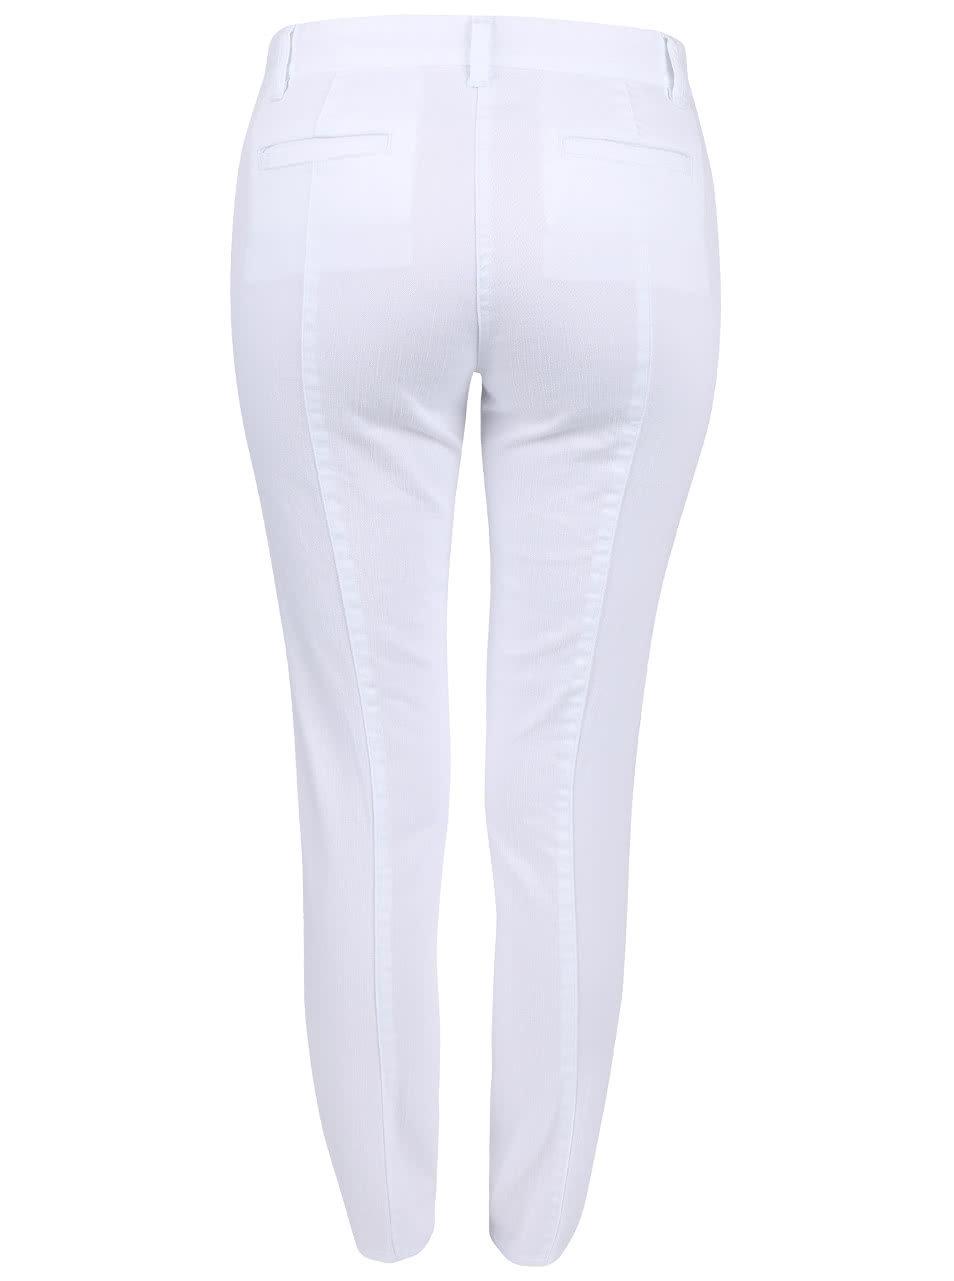 d5cdd7aaed Biele dámske nohavice s gombíkmi Nautica ...